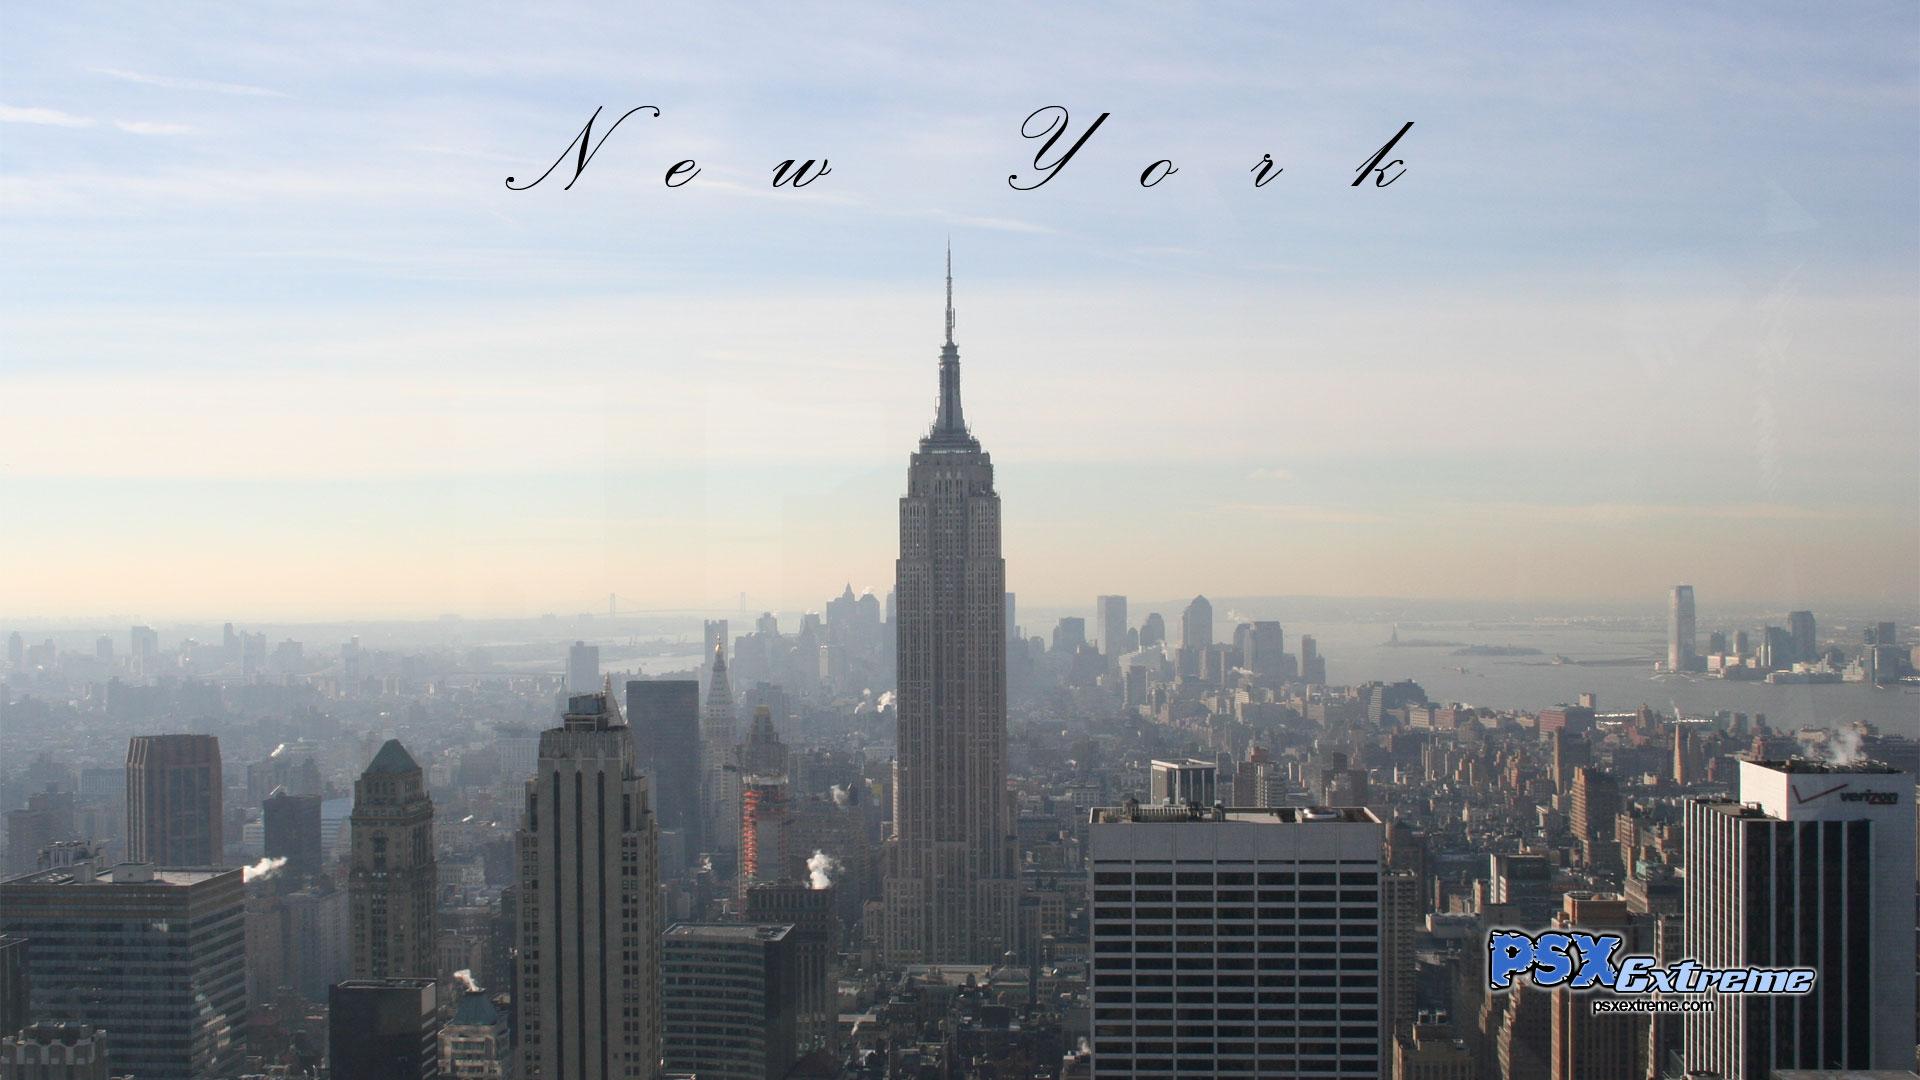 new york widescreen wallpaper Wallpapers Mania 1920x1080